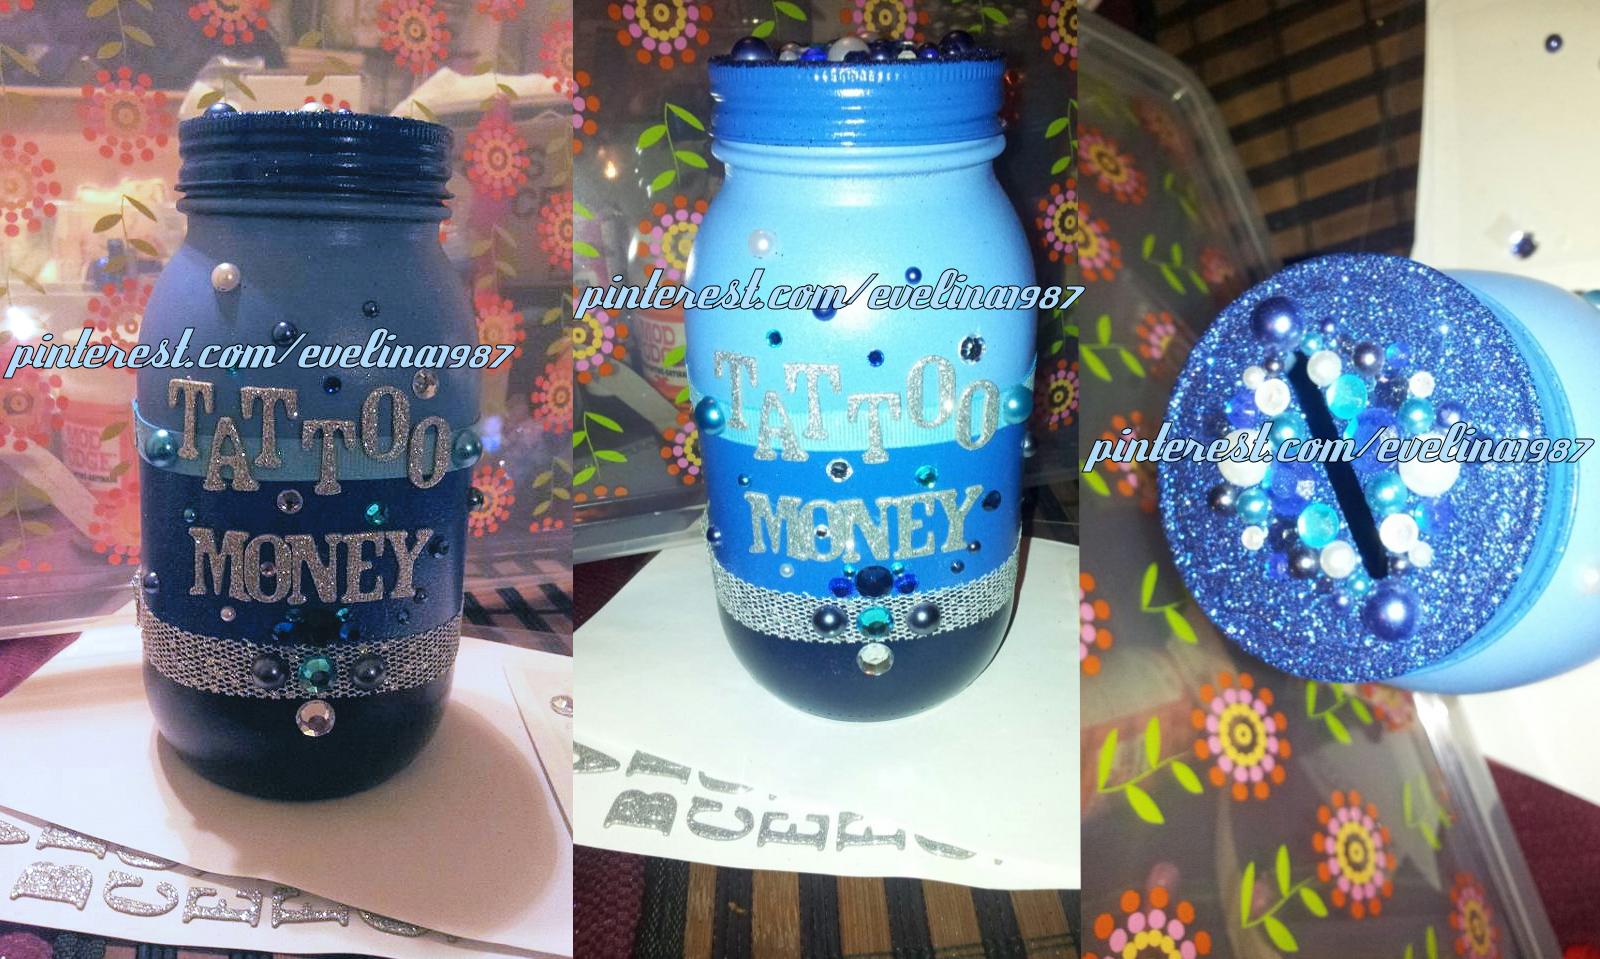 Diy Tattoo Money Jar Mason Jar Michael S Crafts W Coin Slot Lid Etsy I Used Rustoleum Spray Paint Alphabet Stickers From Michael S Whi 07 30 Money